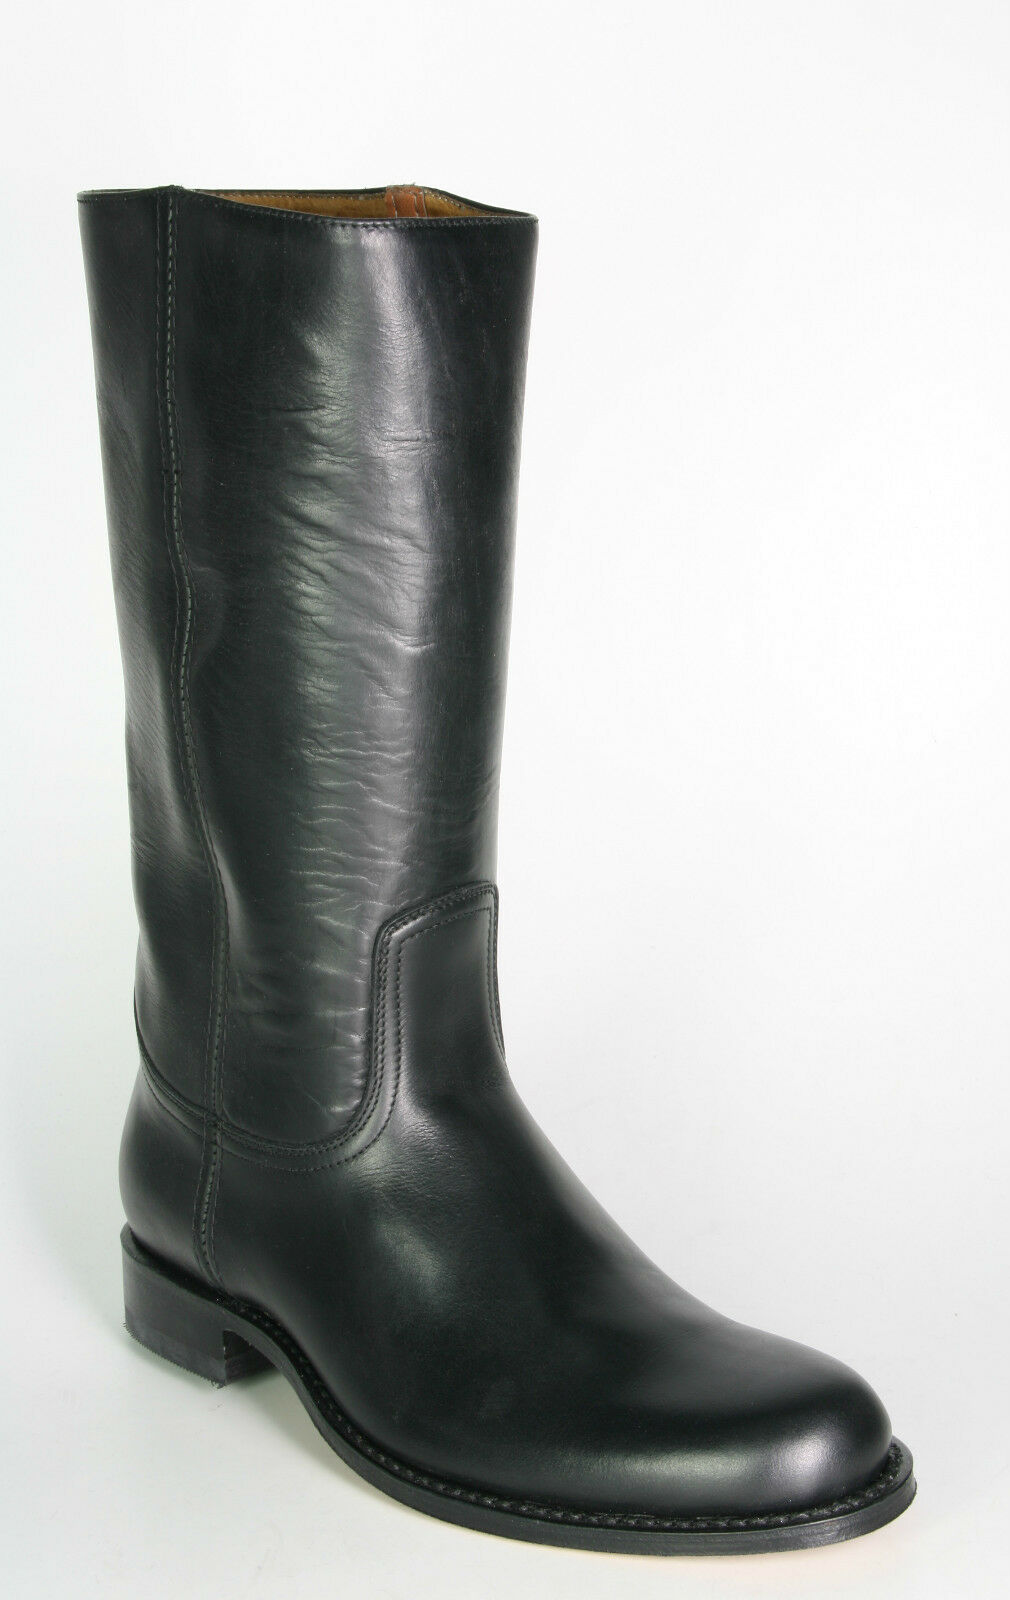 Grandes zapatos con descuento 3625 Sendra Stiefel STREET Negro Boots schwarz Handarbeit Rahmengenäht